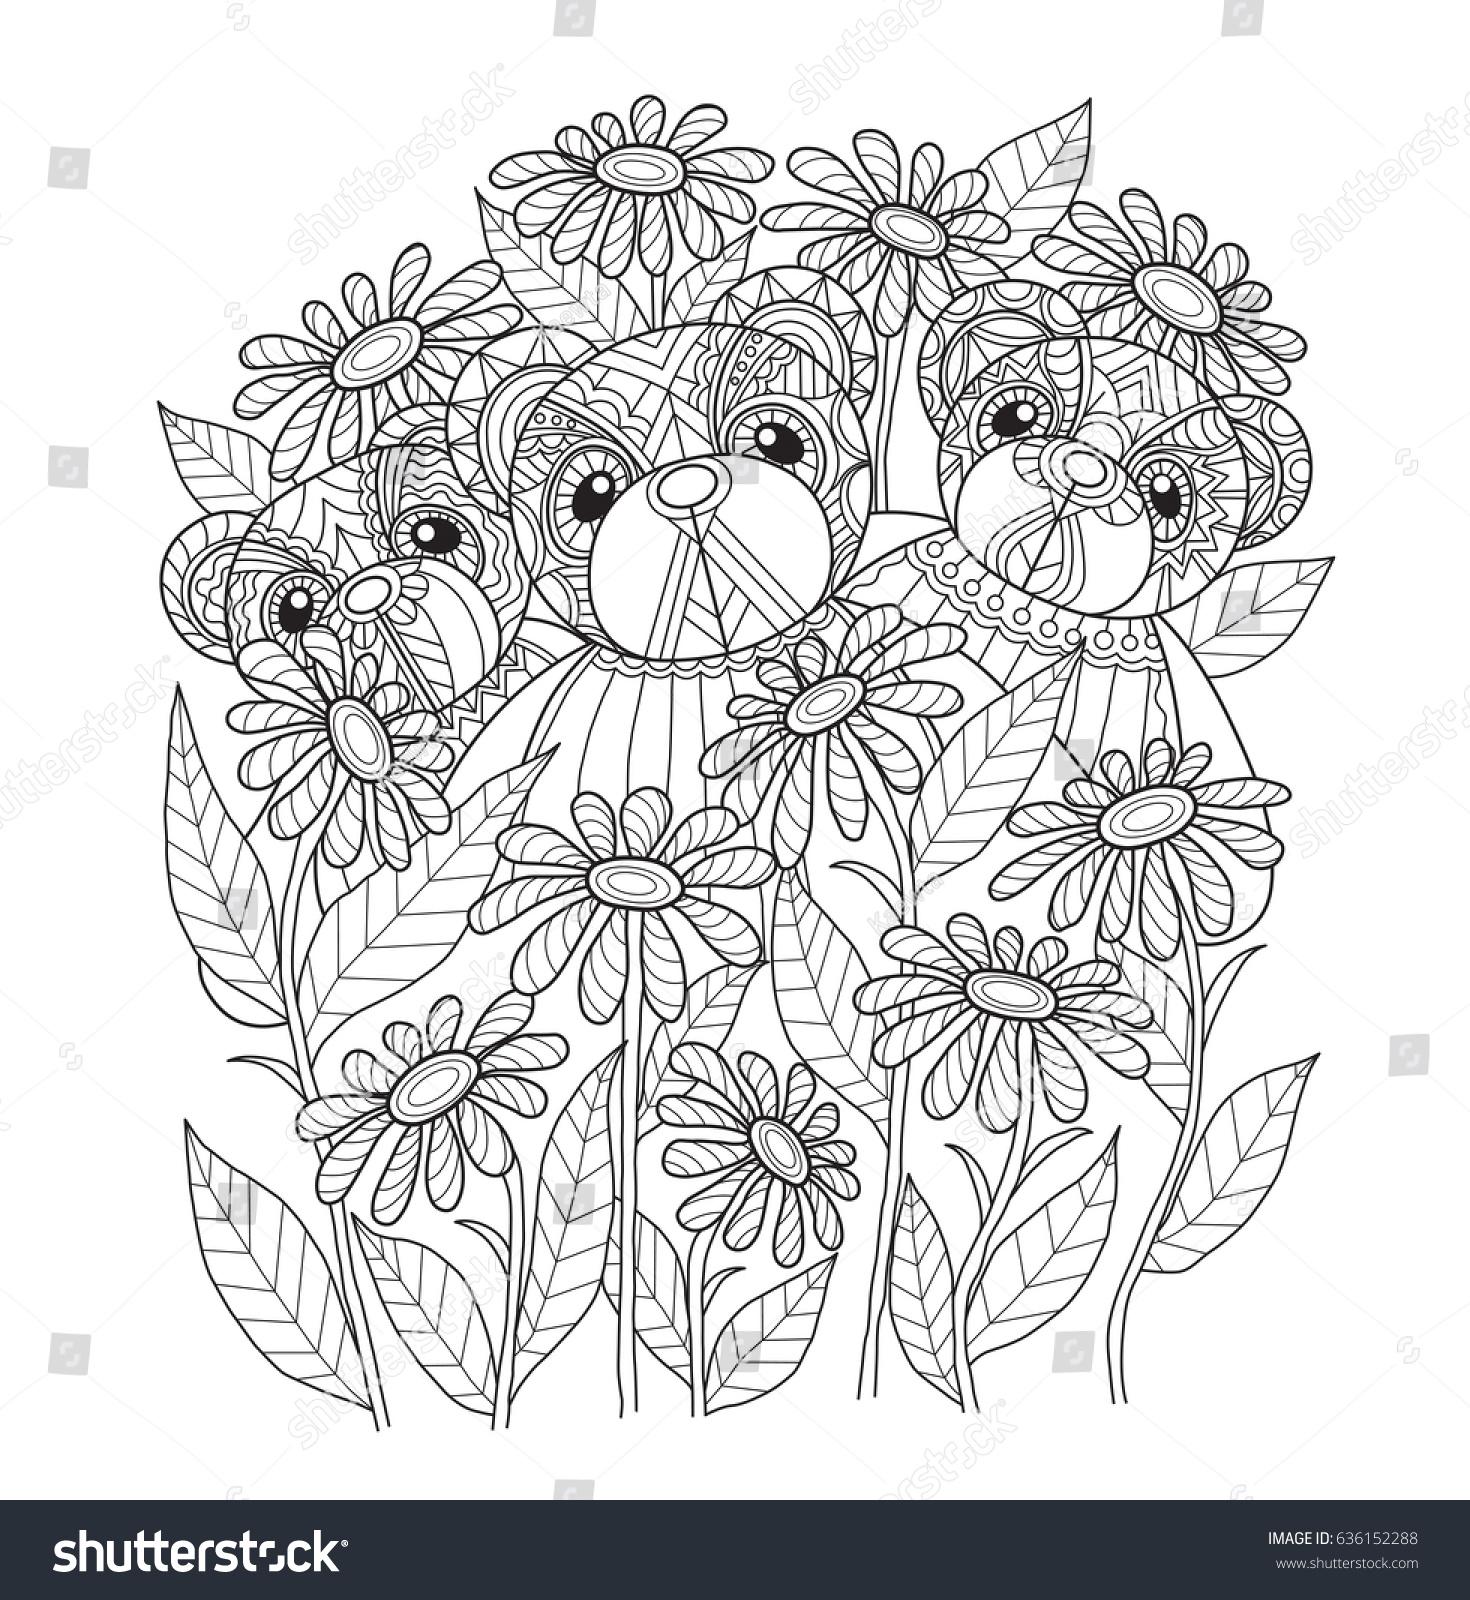 3 teddy bears garden zentangle stylized stock vector